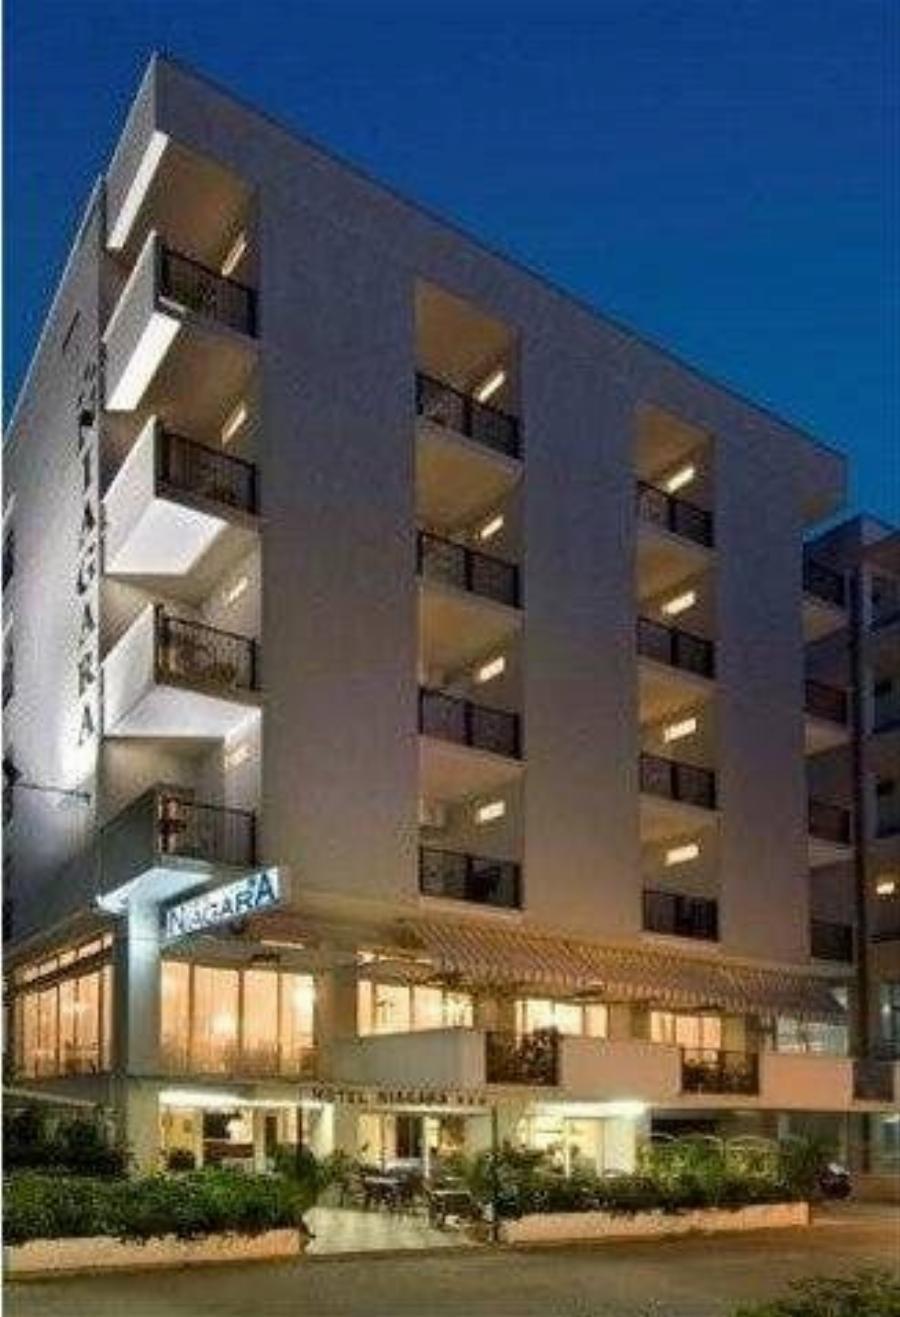 Hotel Niagara Cattolica